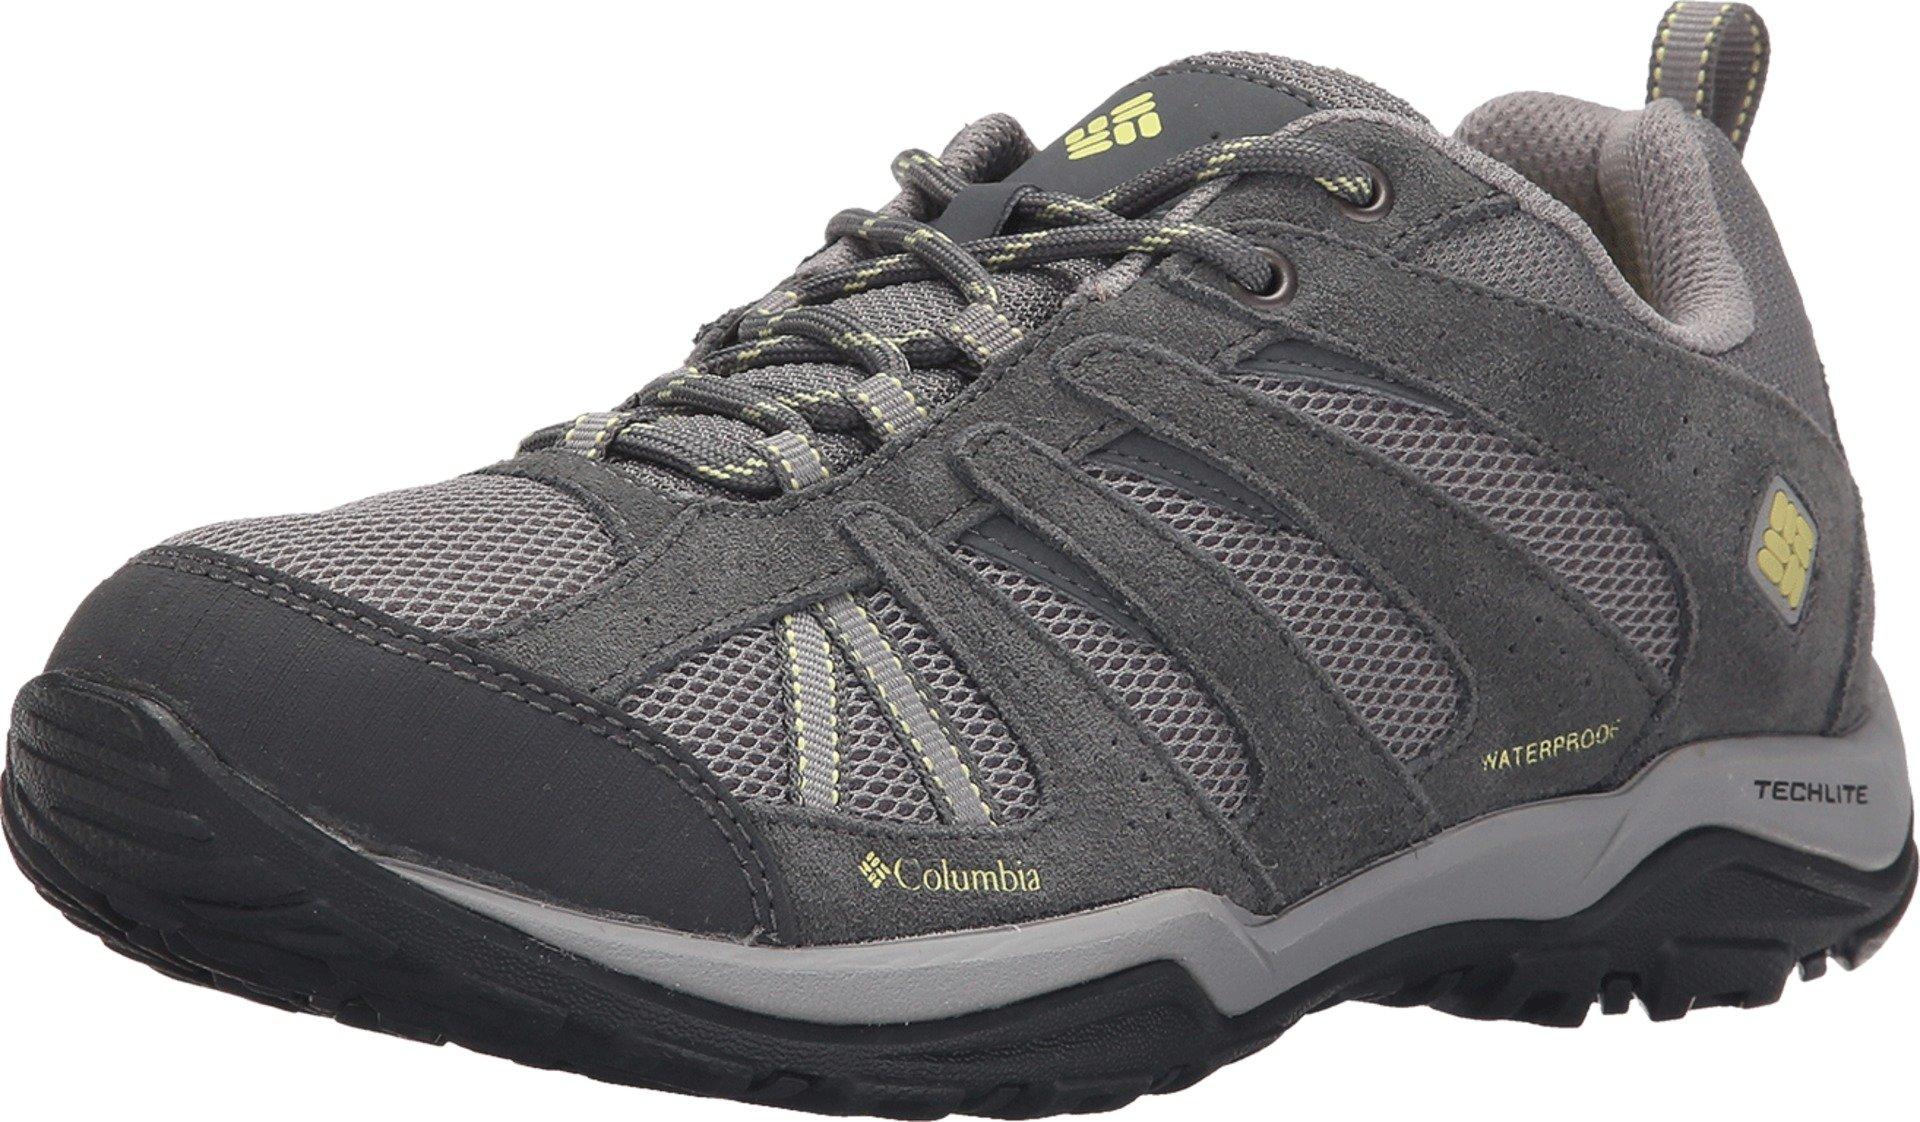 Columbia Women's Dakota Drifter Waterproof Hiking Shoe, Light Grey, Sunnyside, 7.5 B US